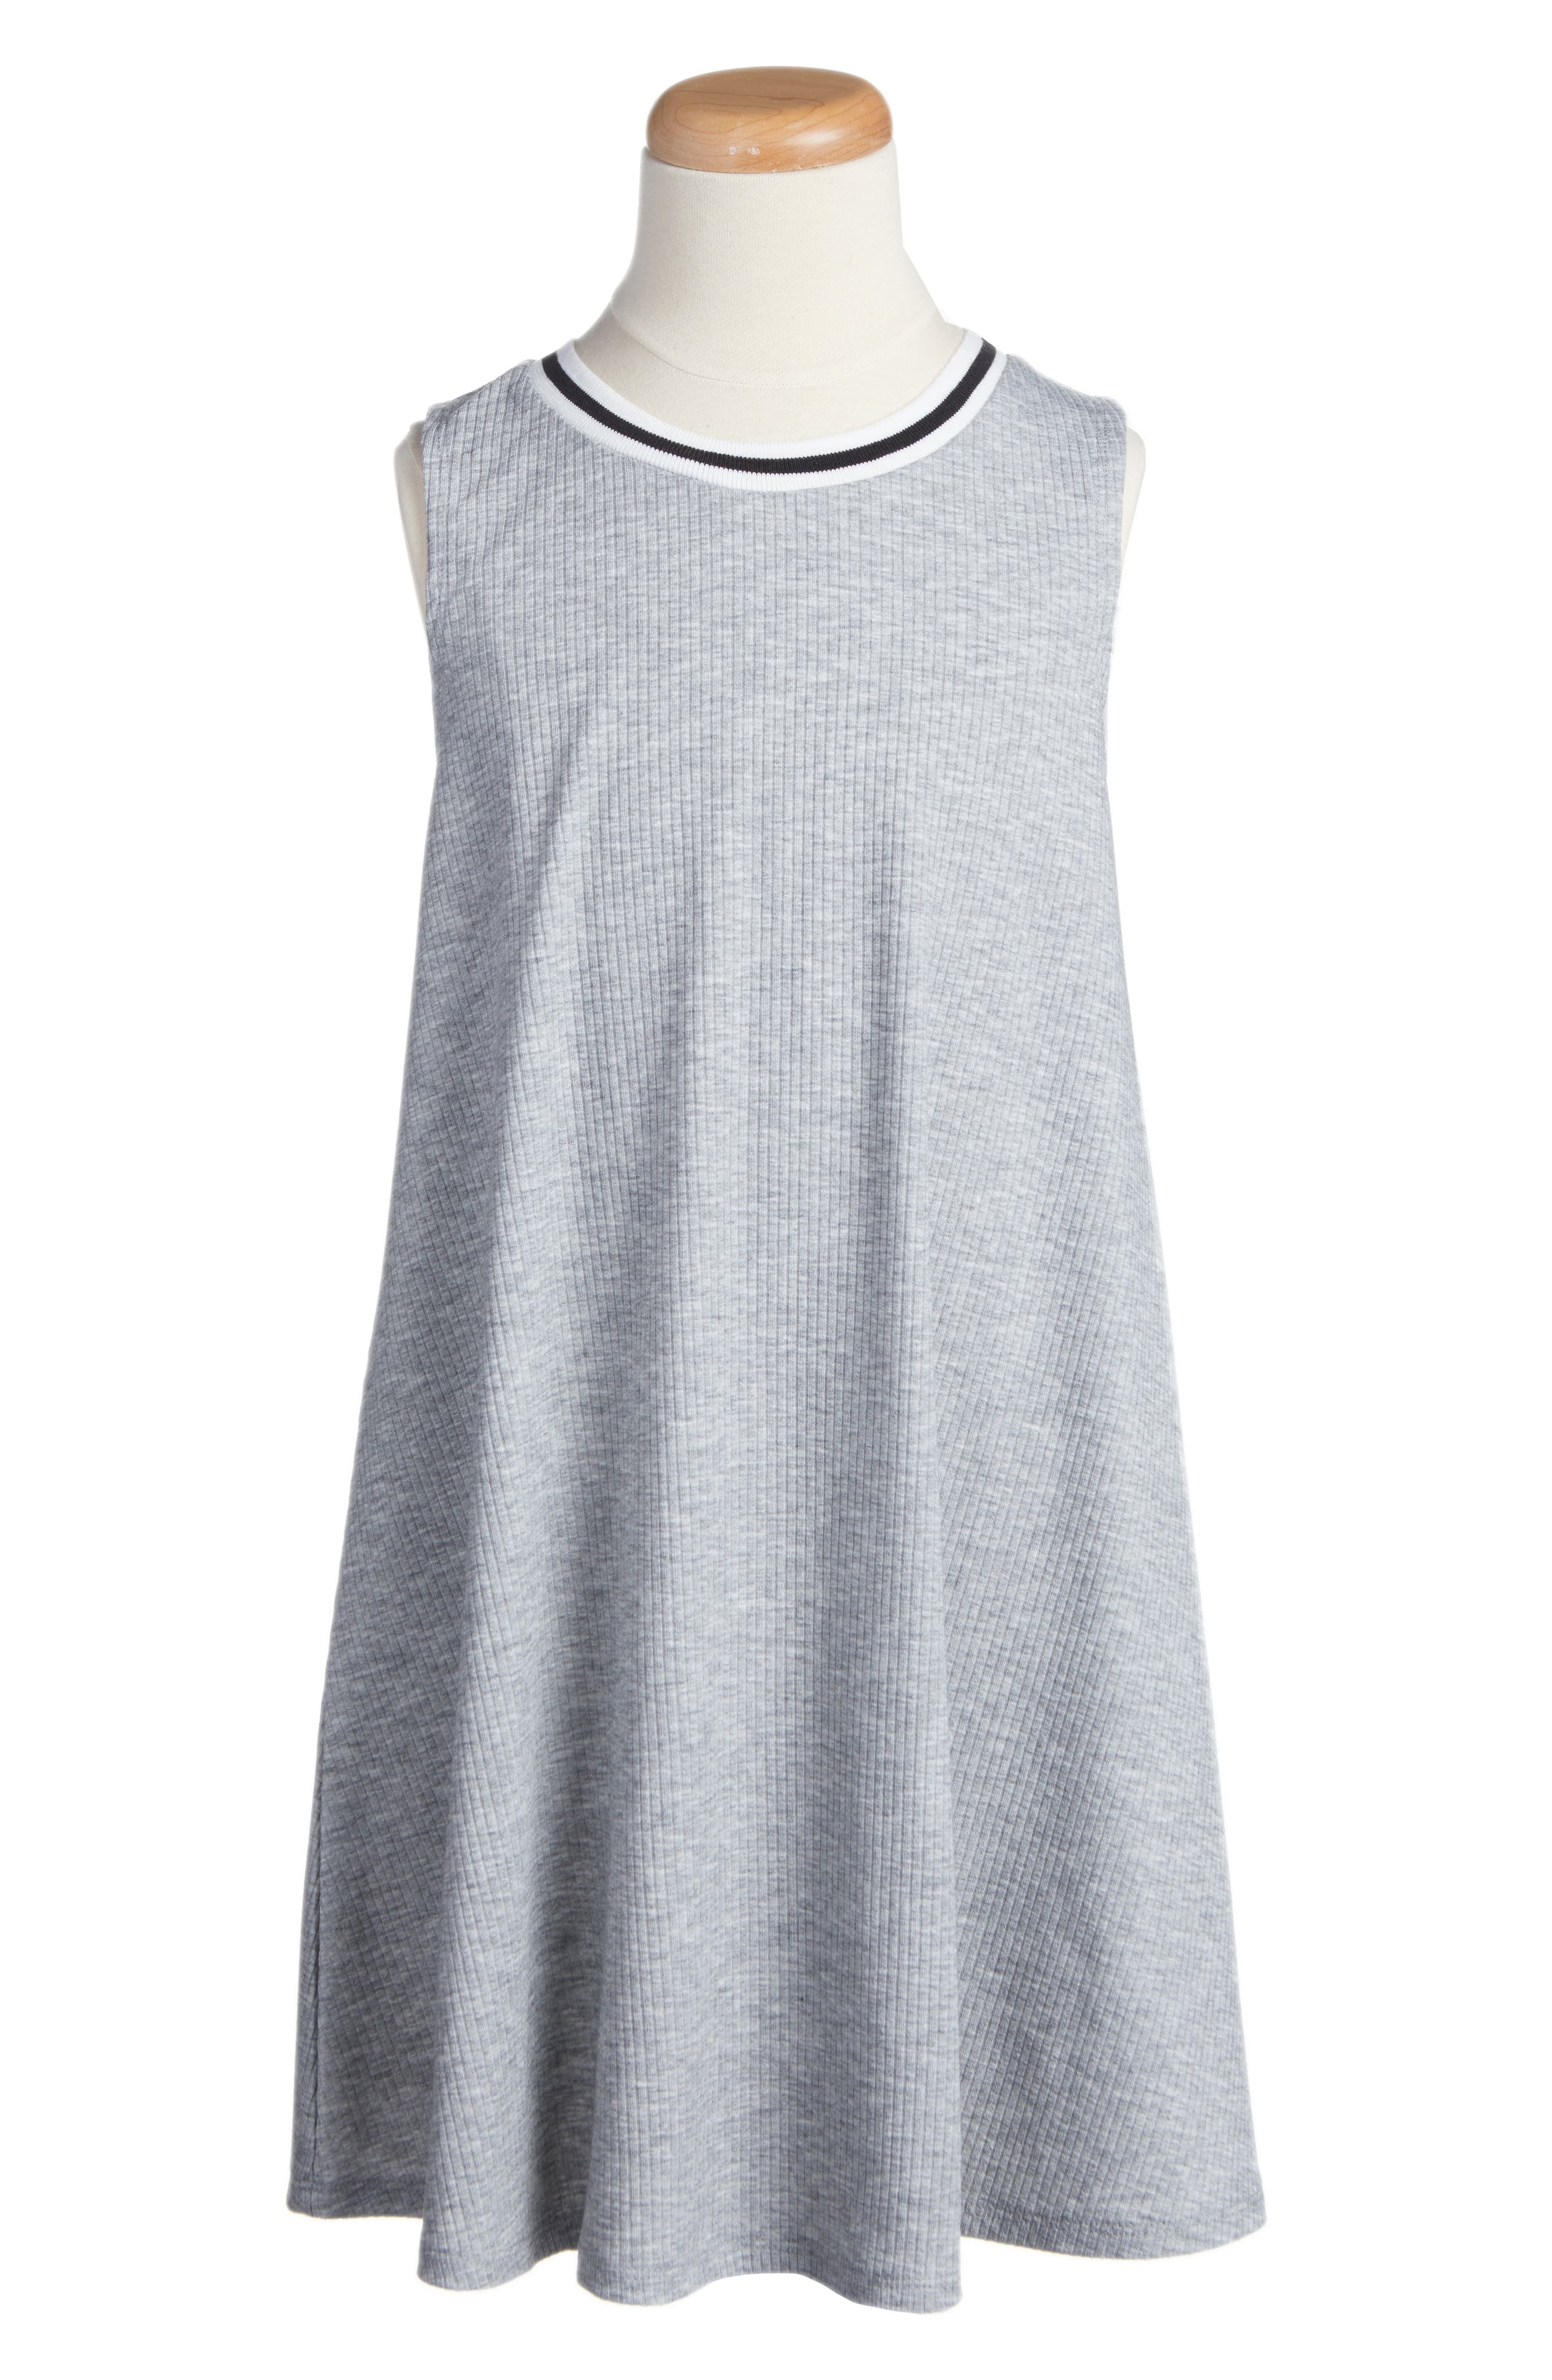 Ringer Tank Dress,                         Main,                         color, Heather Gray